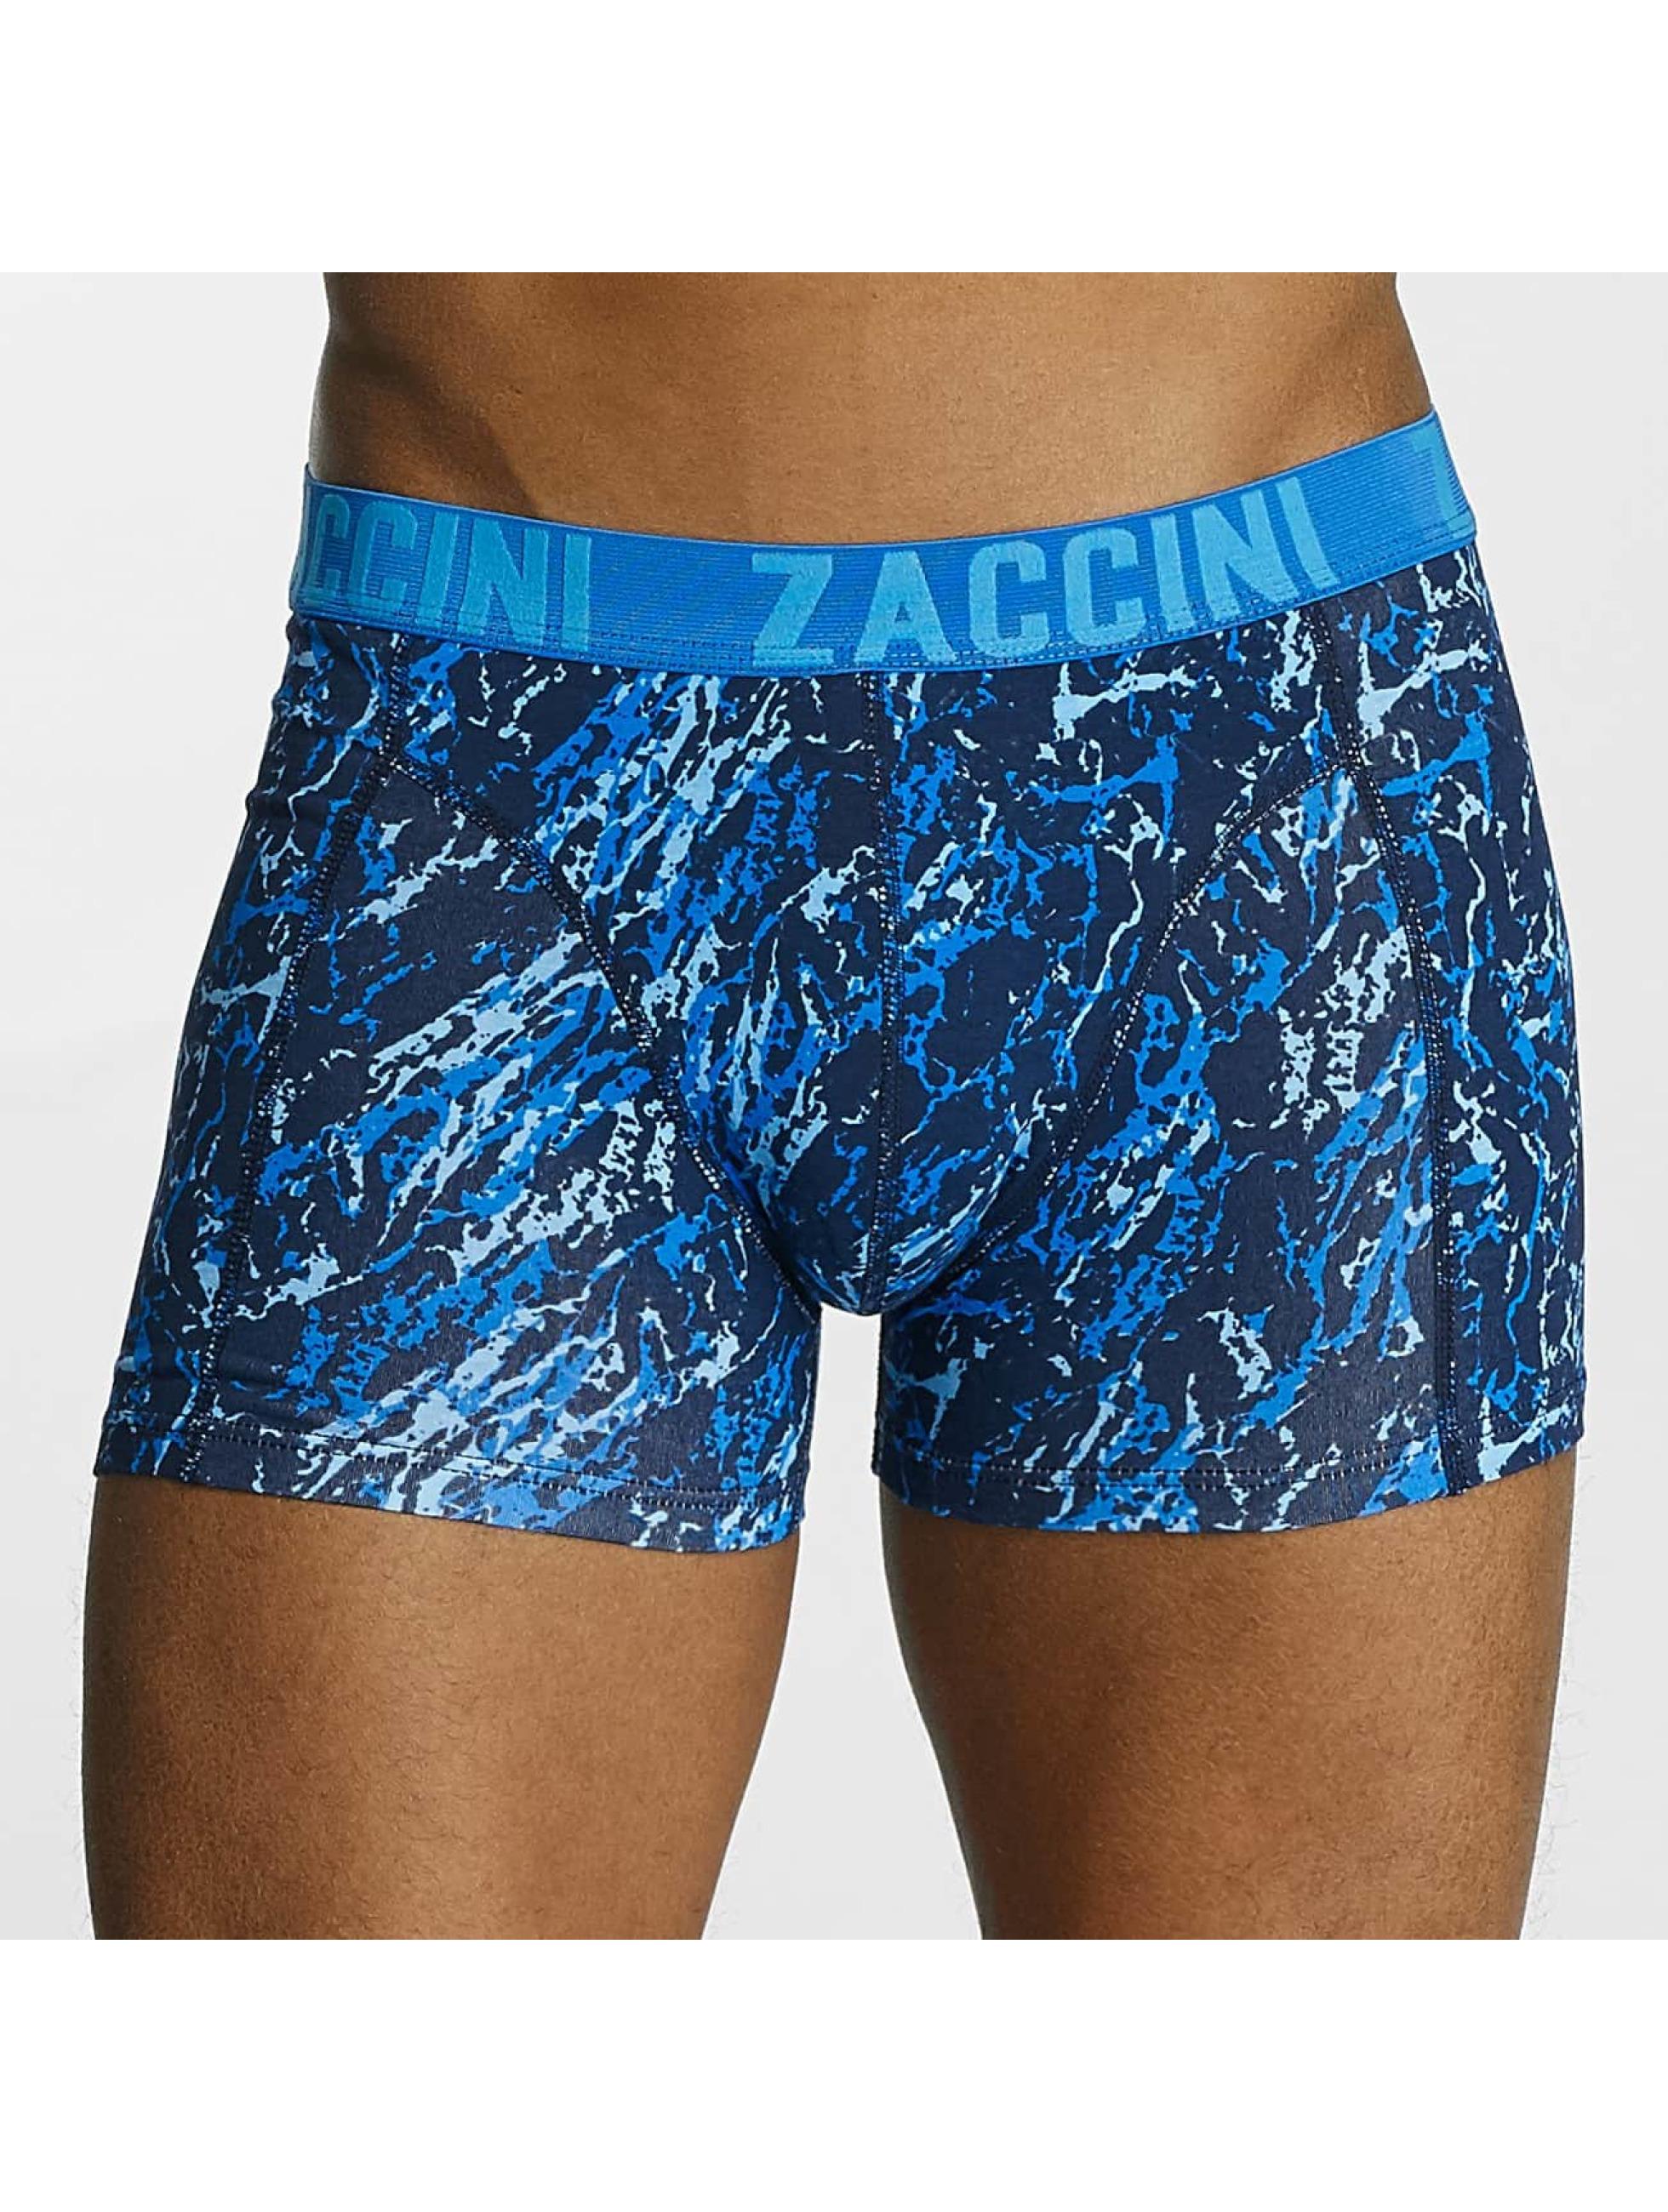 Zaccini Boxershorts Mineral blau